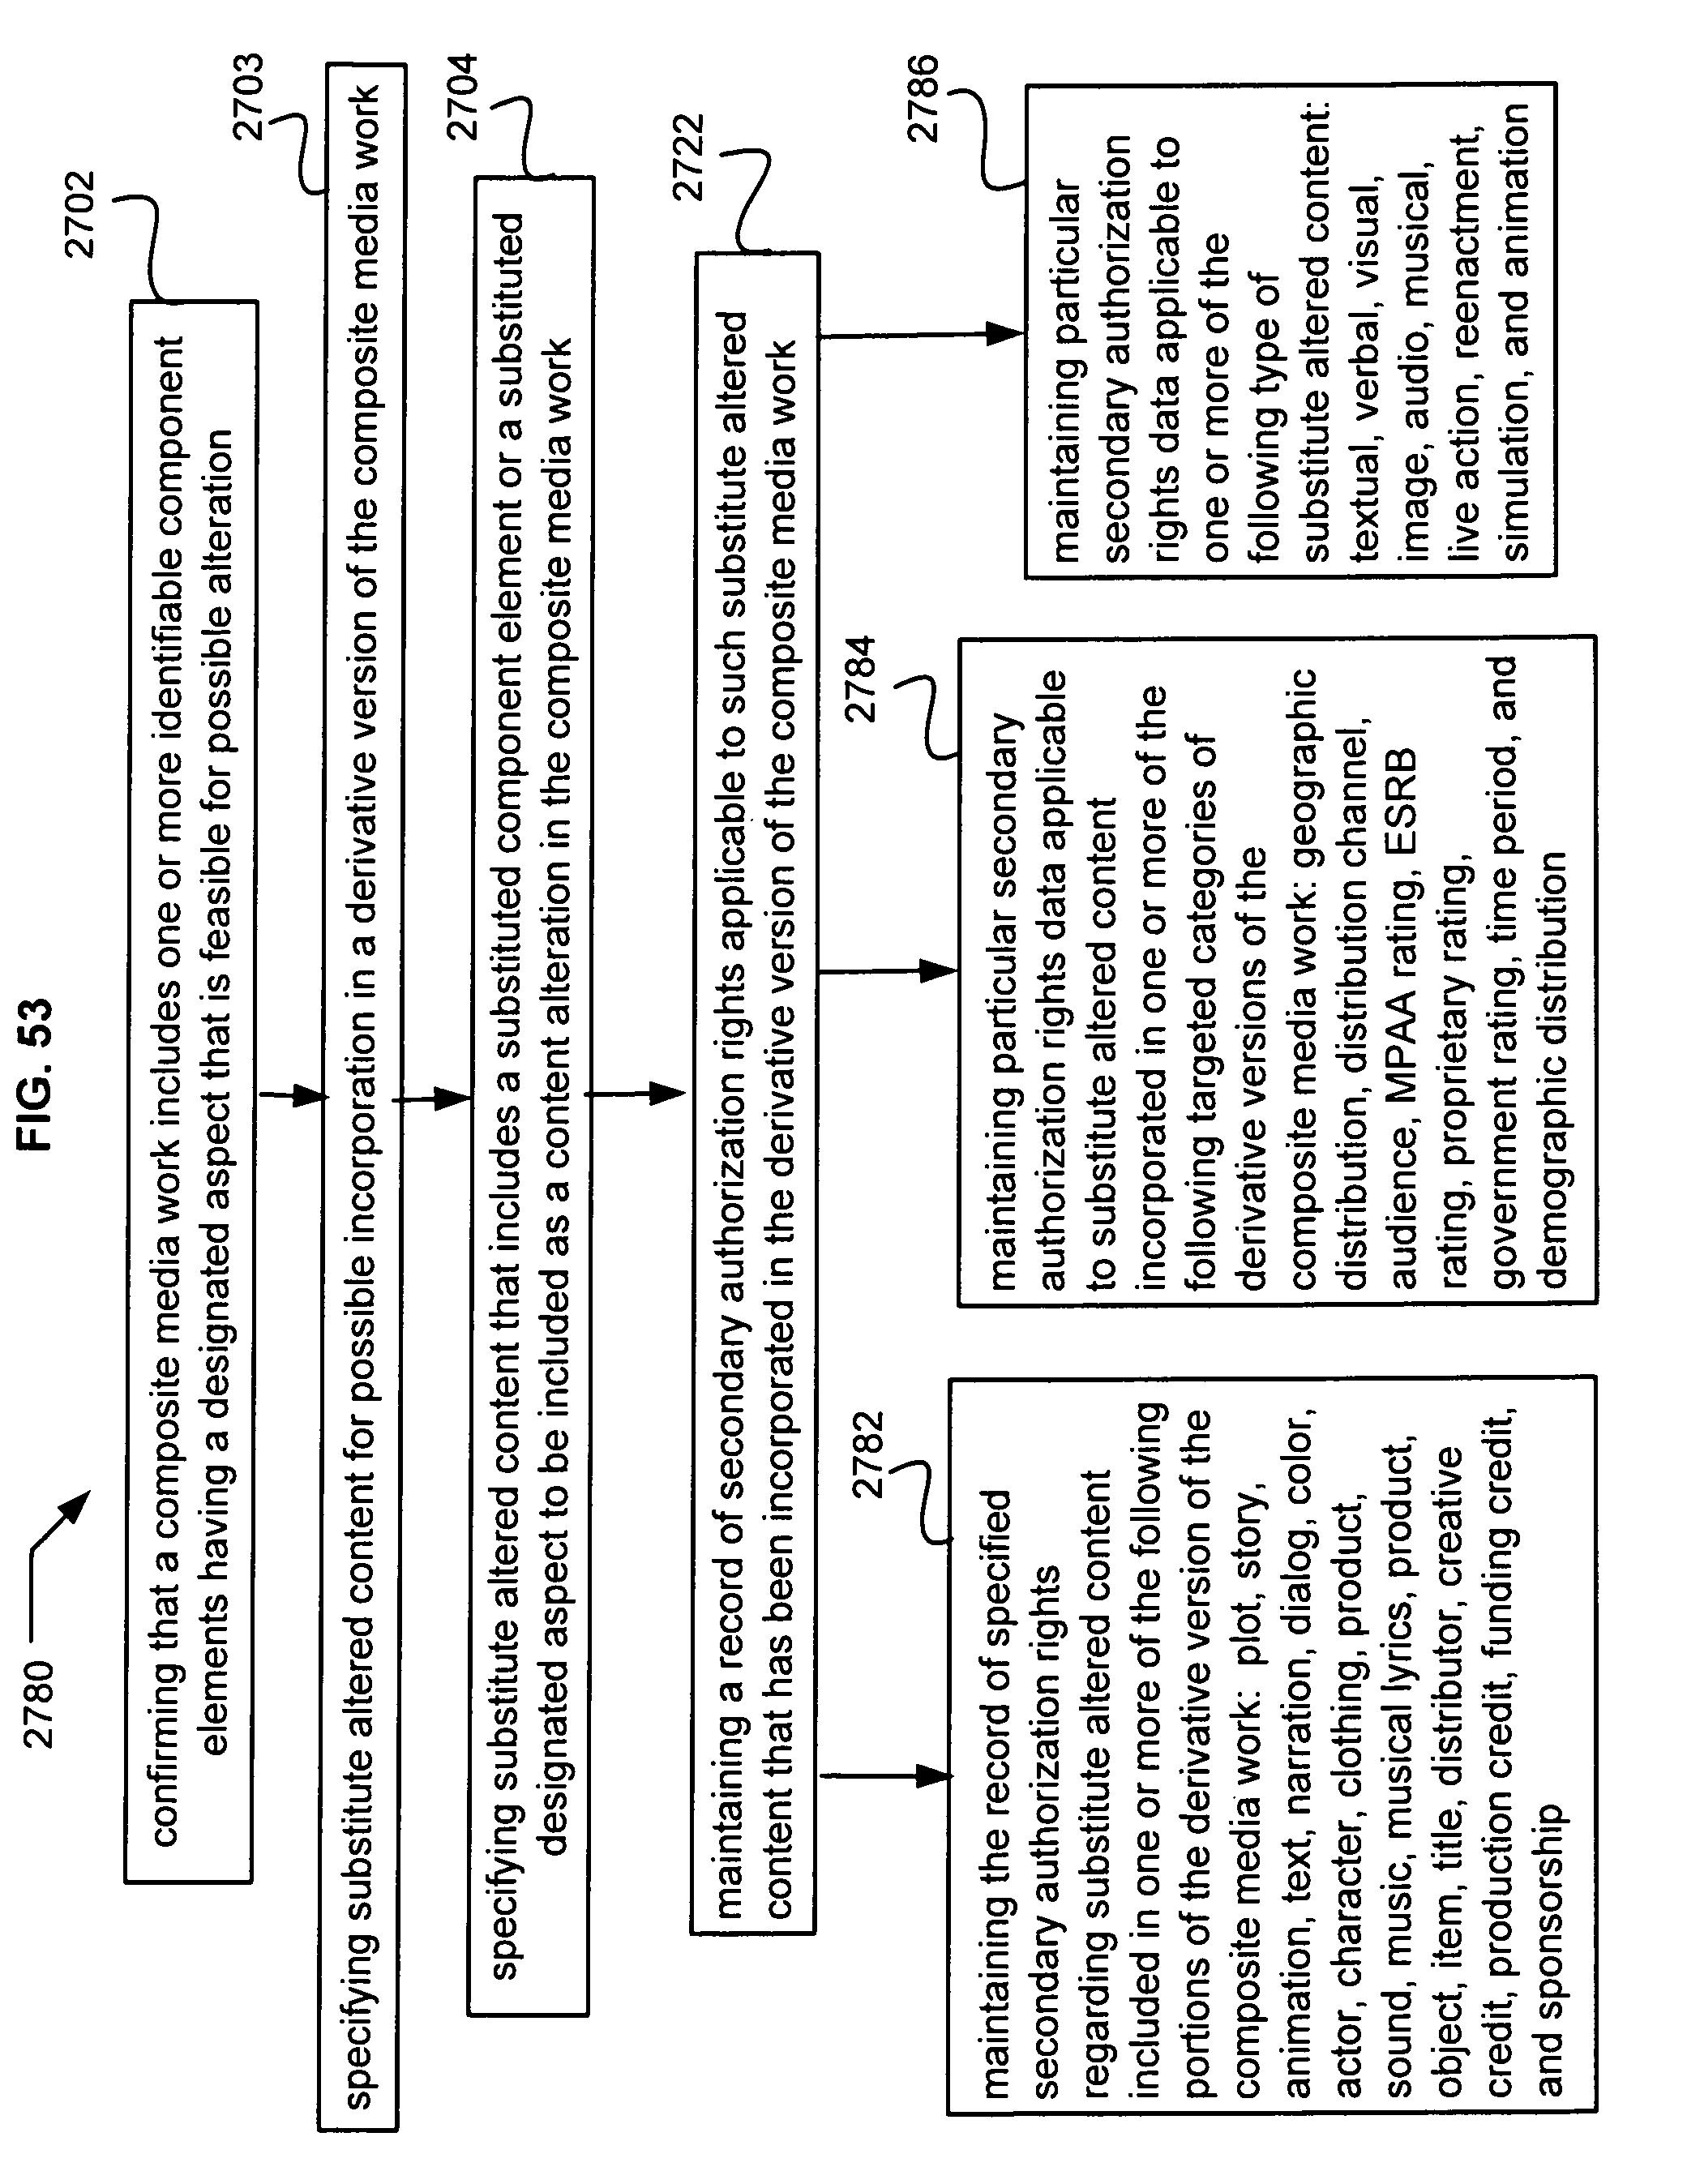 Patent US 9,230,601 B2